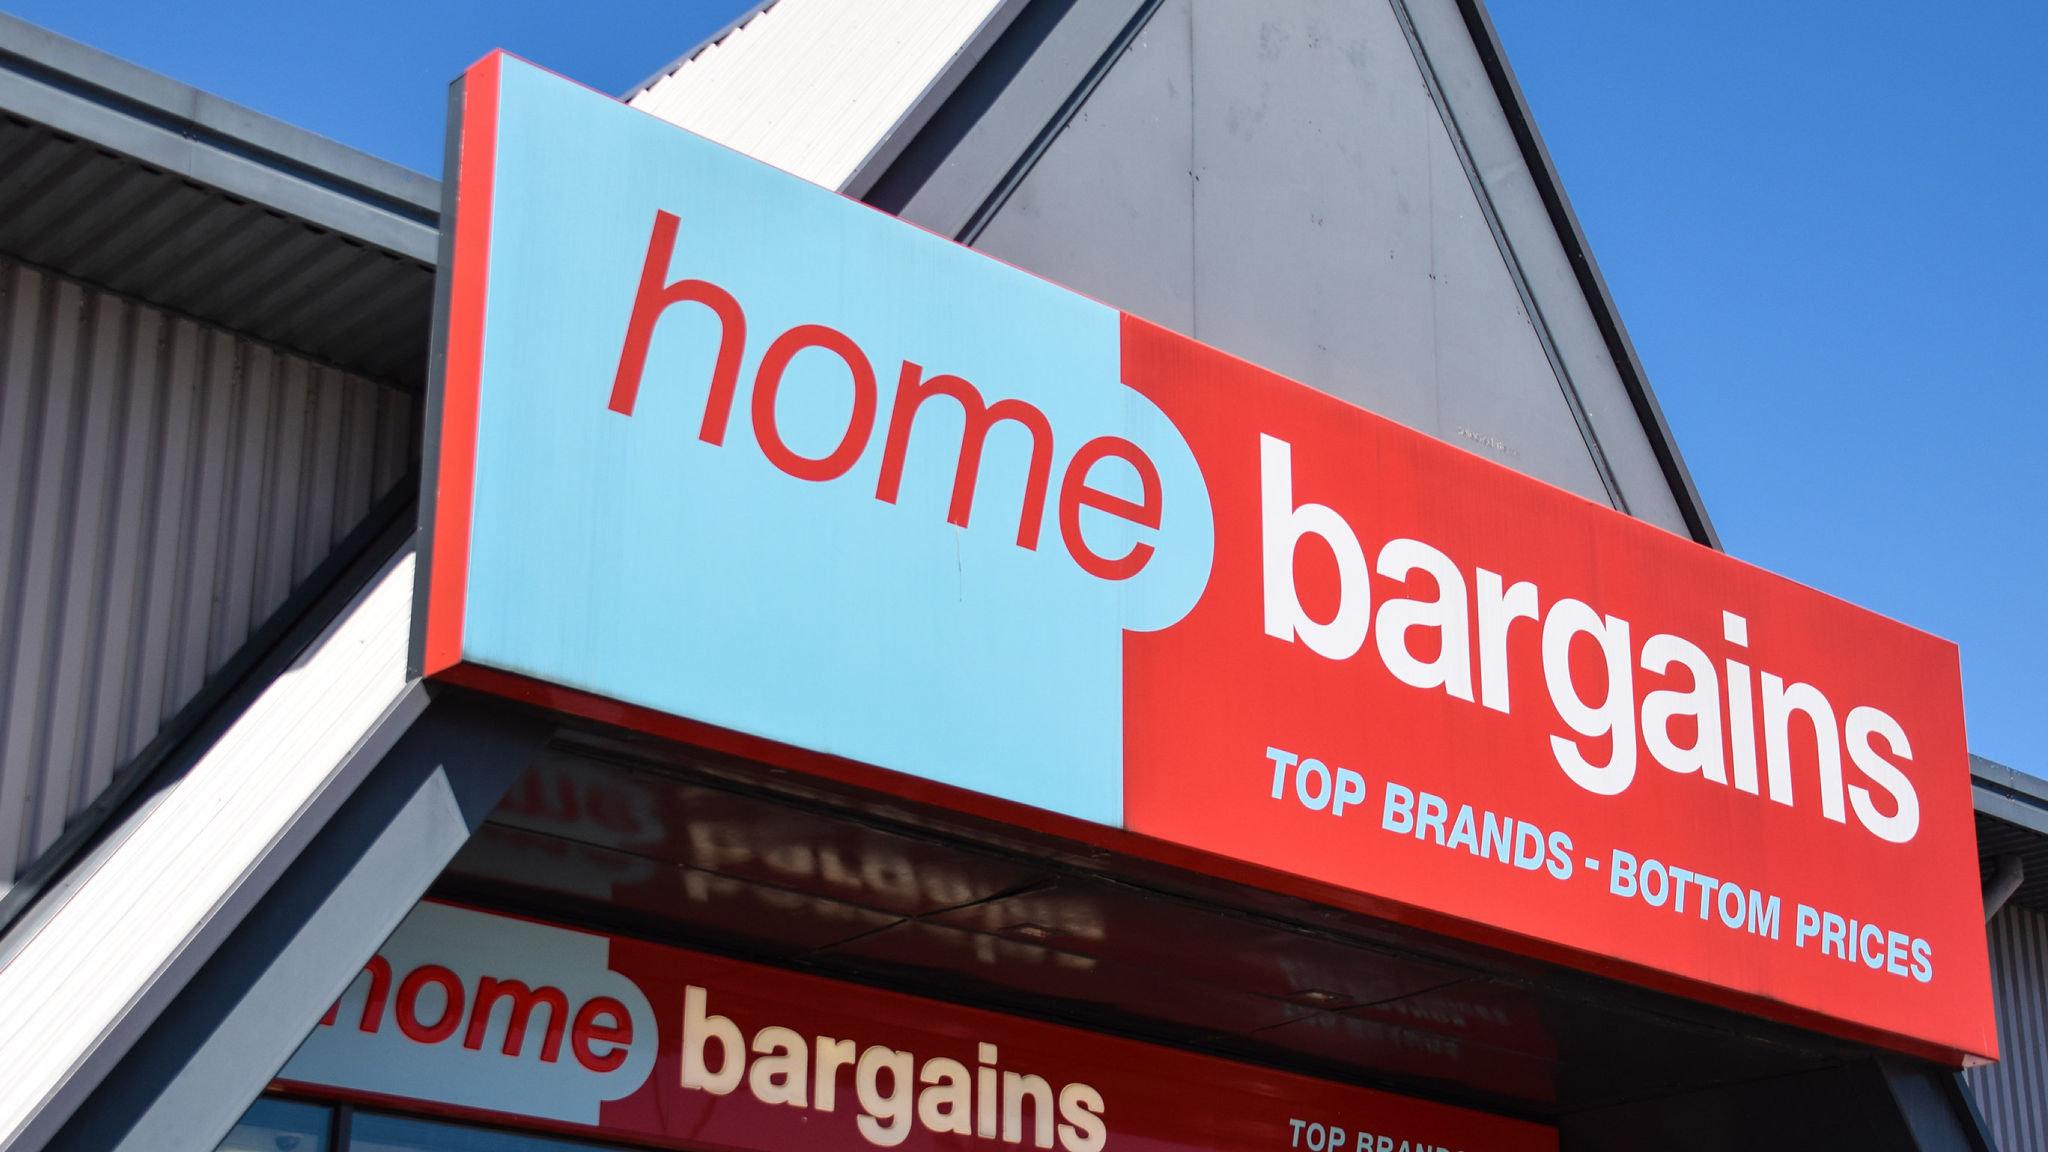 Home Bargains Delivers Bigger Profit Than Harrods Financial Times